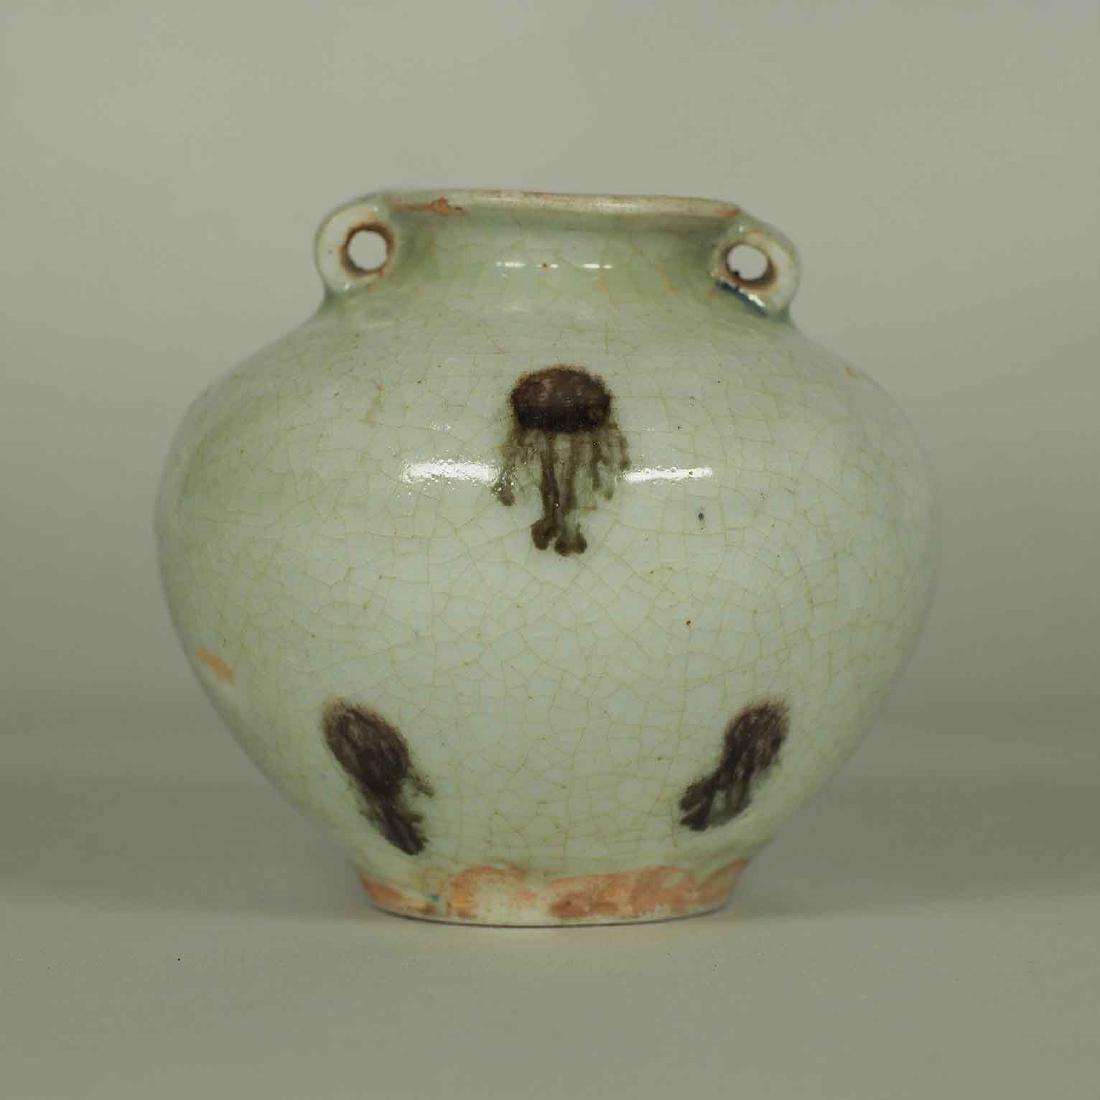 Qingbai Iron-Spots Jarlet, Yuan Dynasty